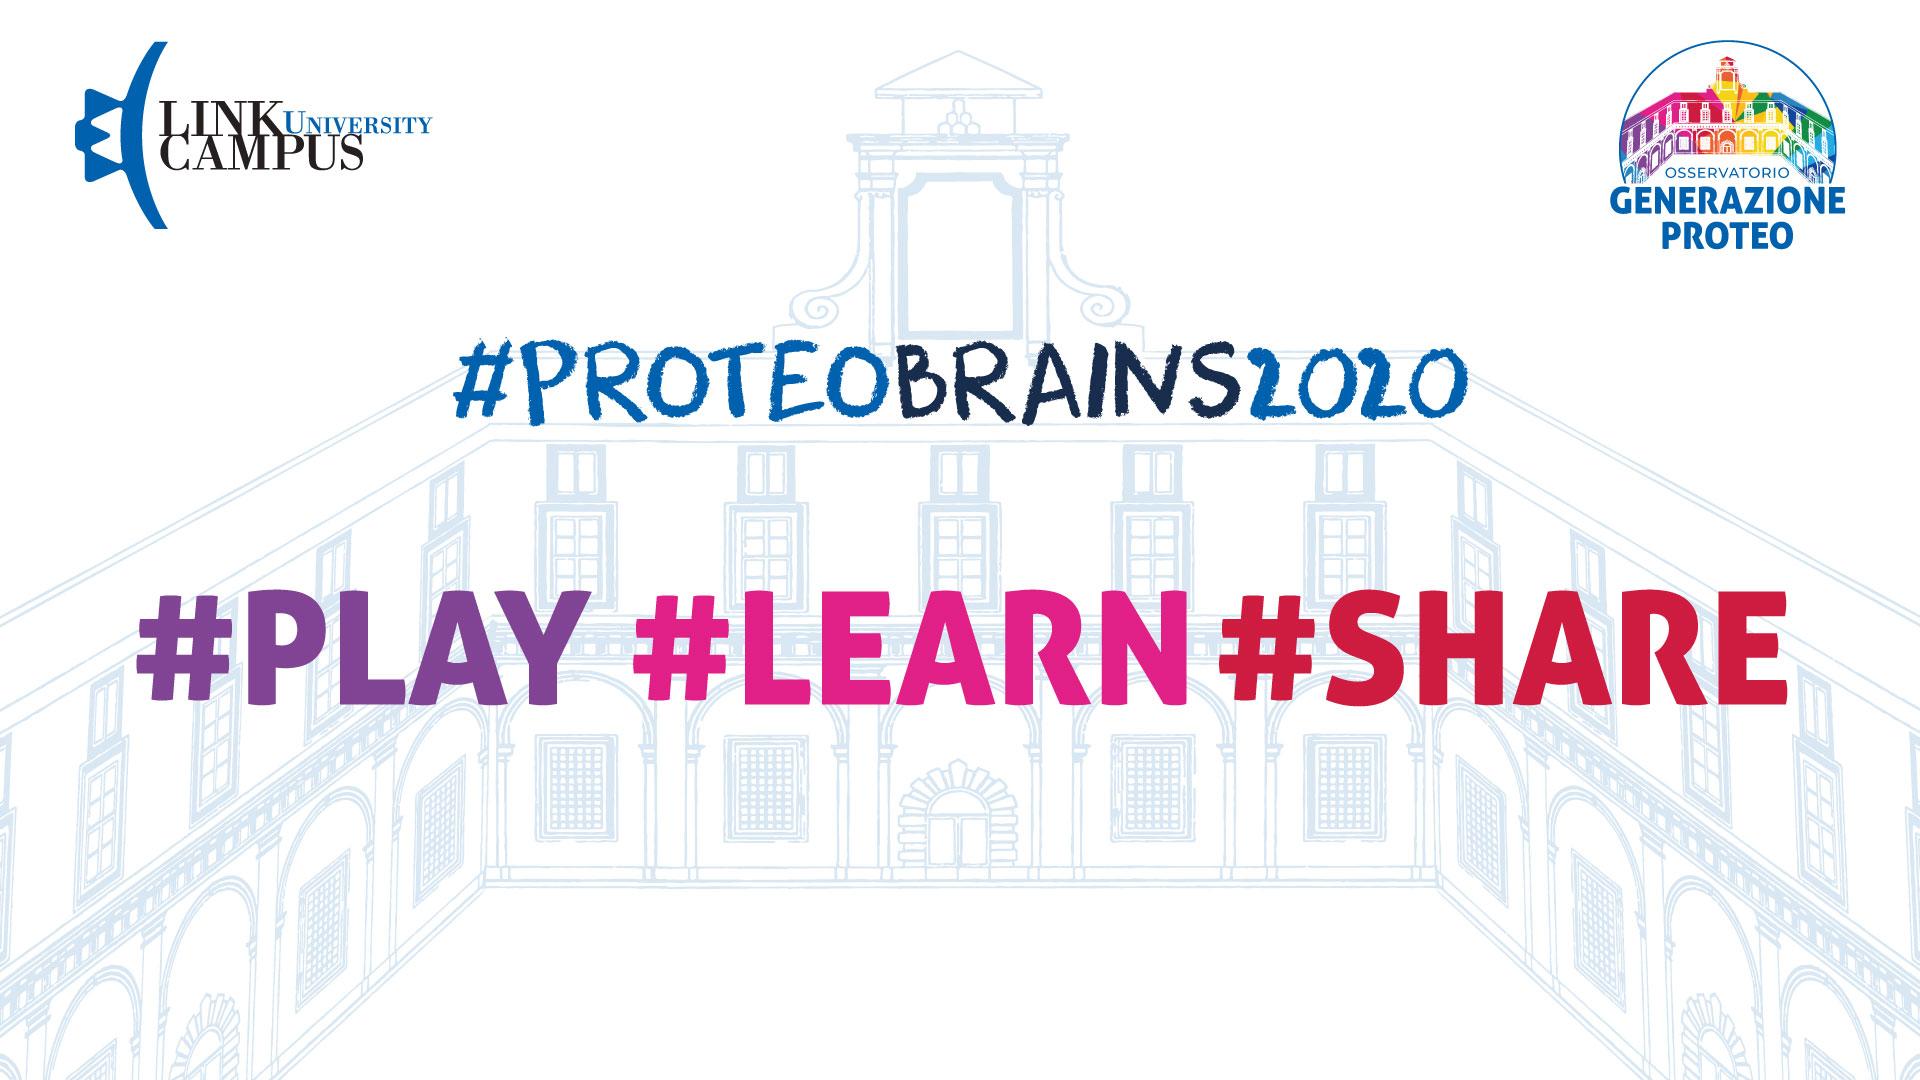 proteobrains2020-#play#learn#share-1